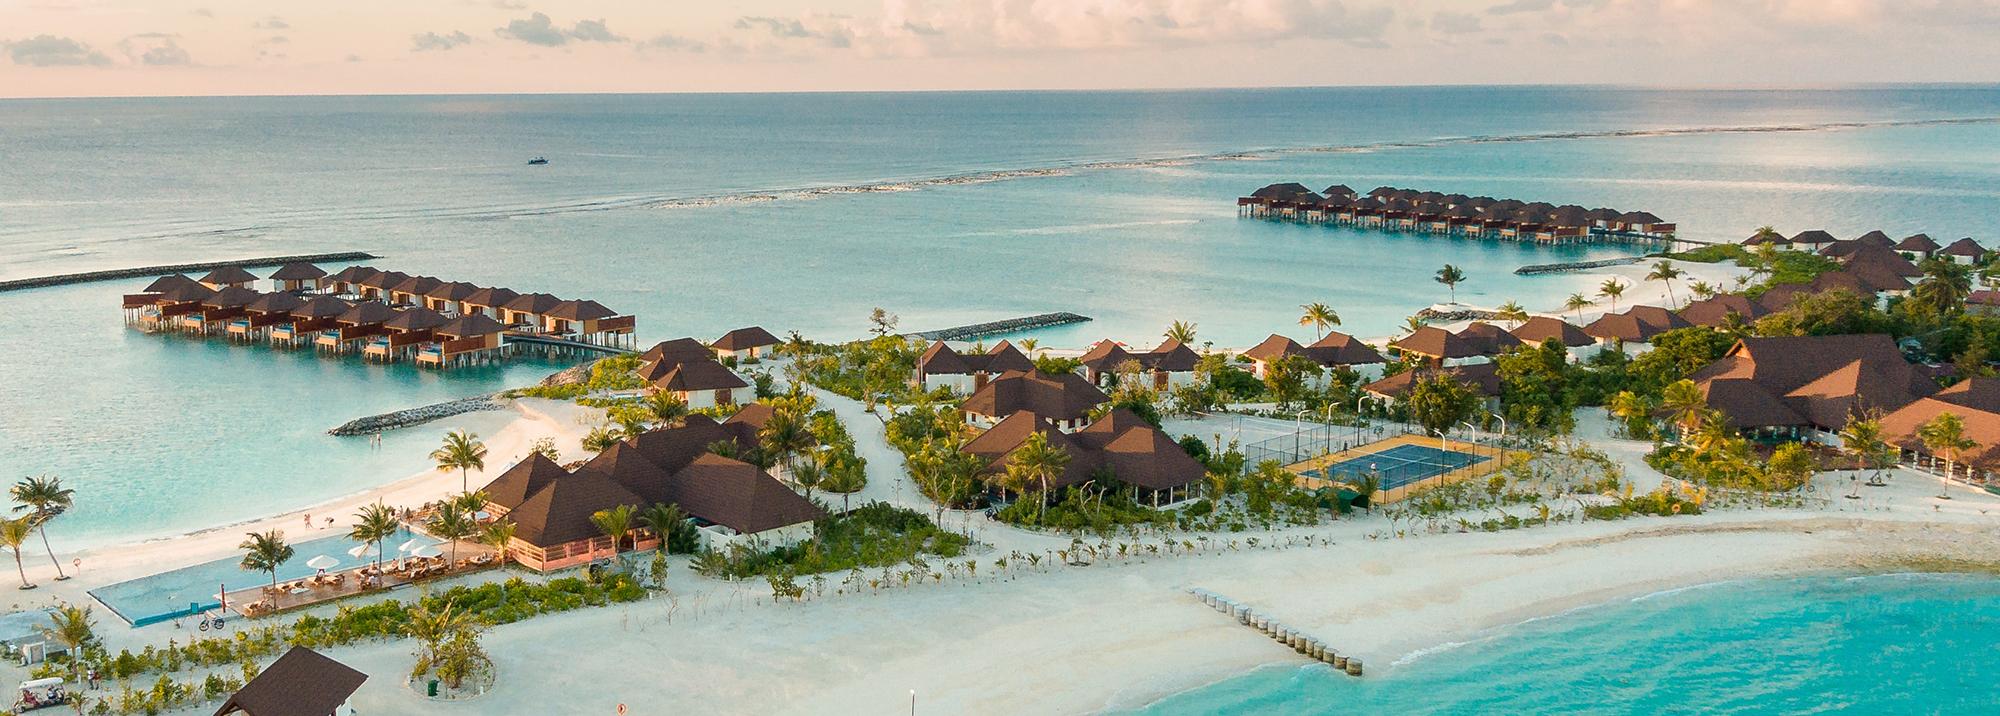 Top 10 All Inclusive Resorts in Maldives Image